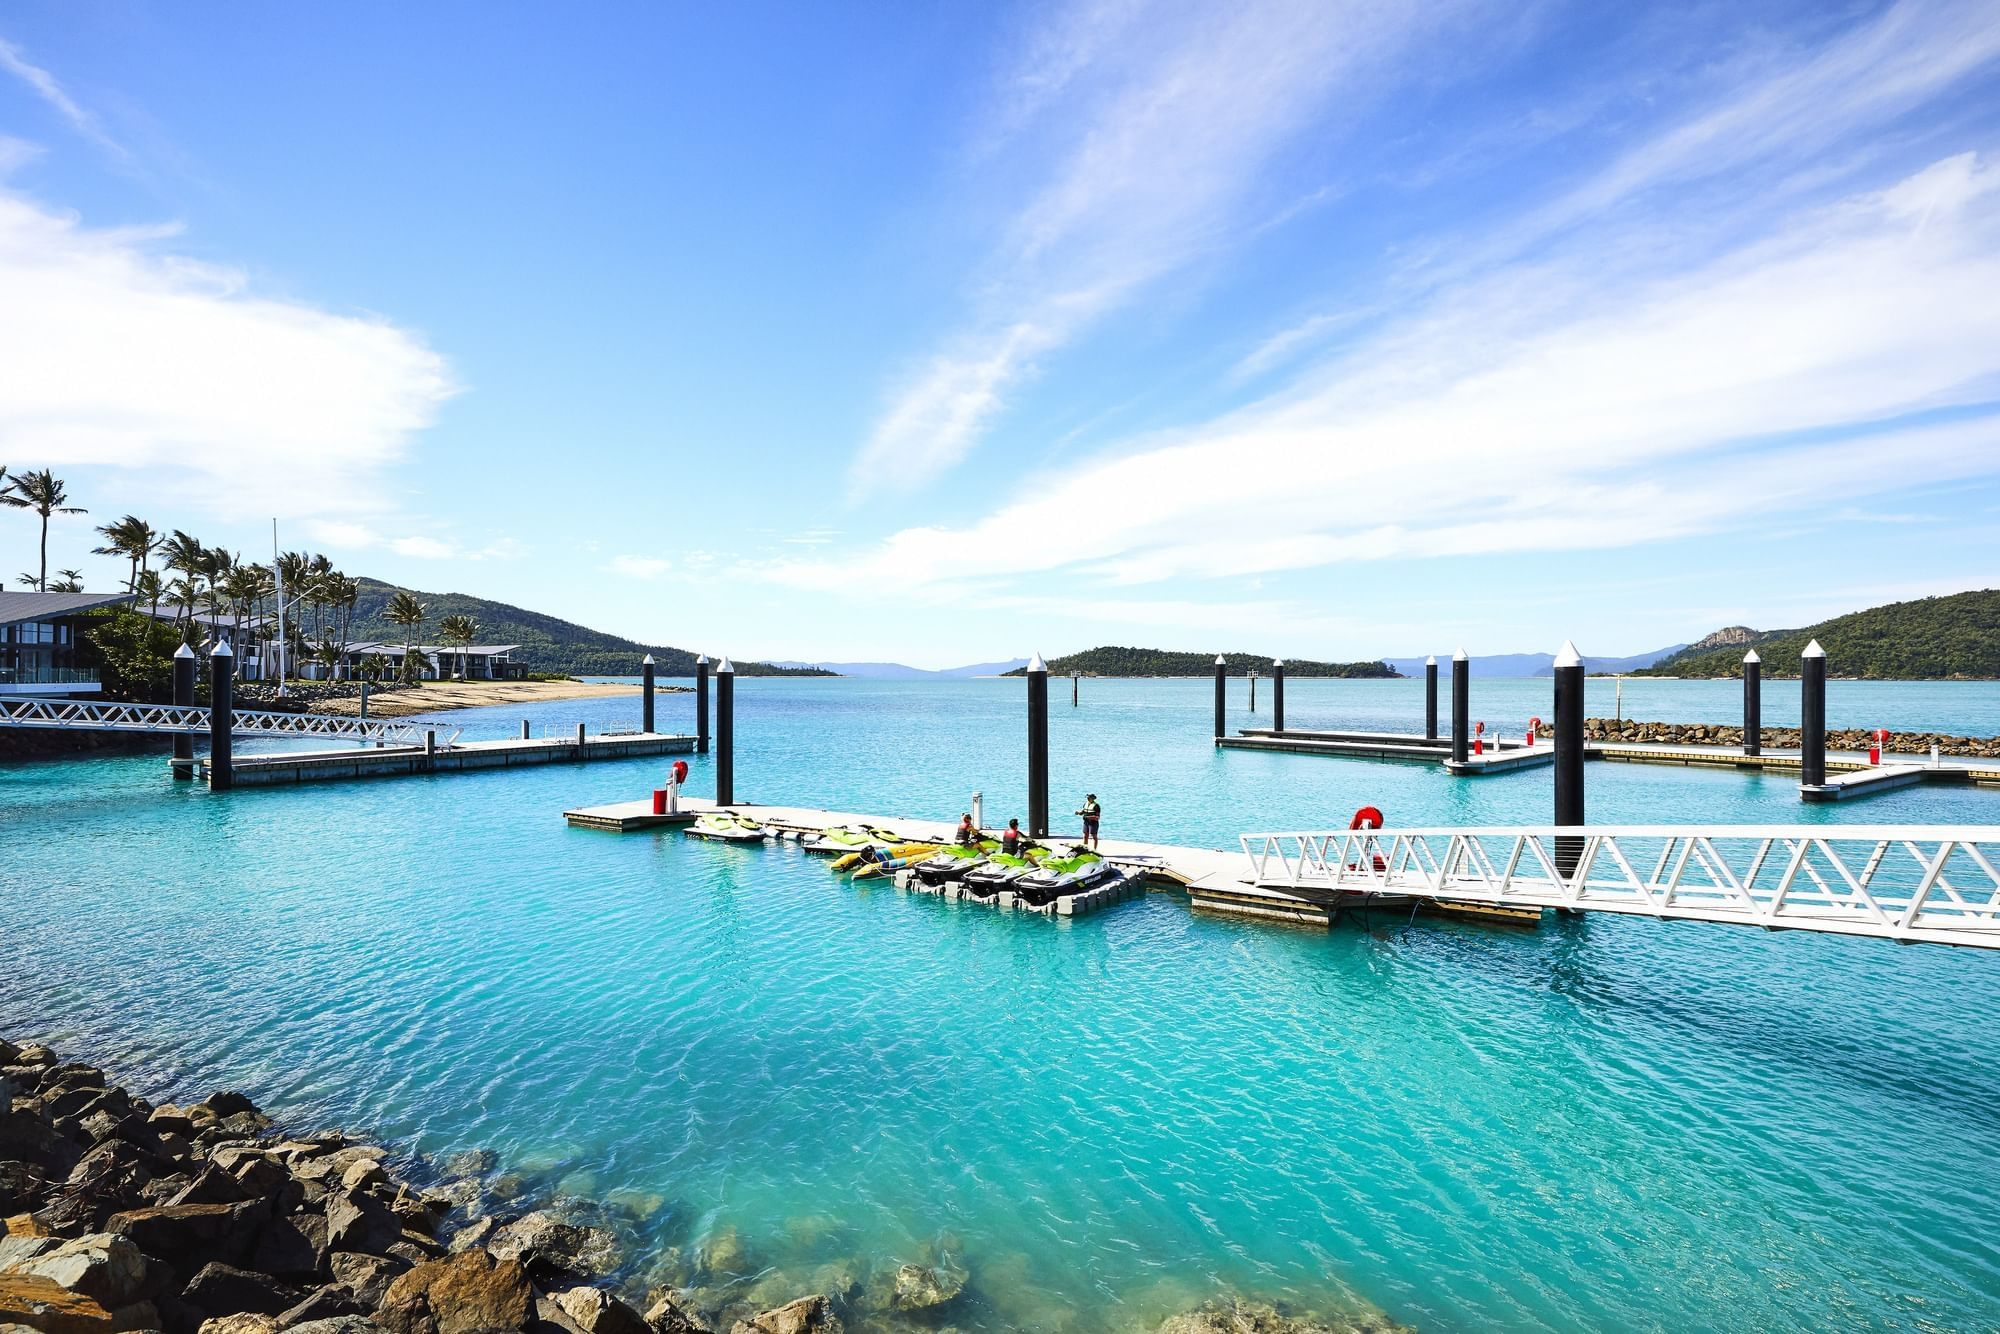 Yacht parked in ocean at Daydream Island Resort